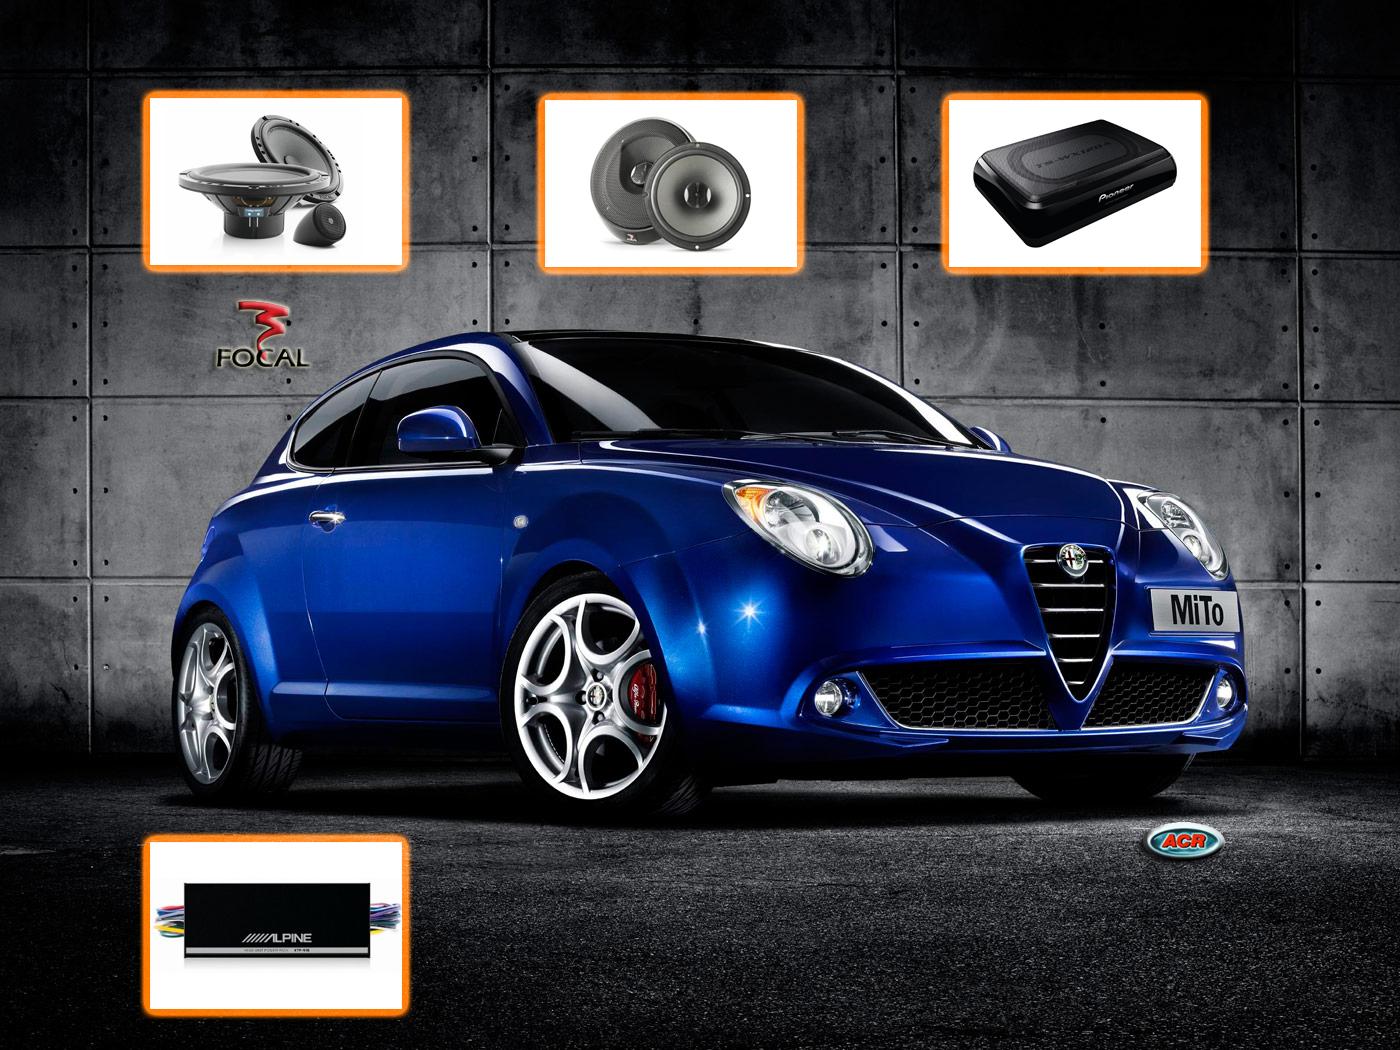 Alfa Romeo MiTo Audio Upgrade Soundsystem 3-0